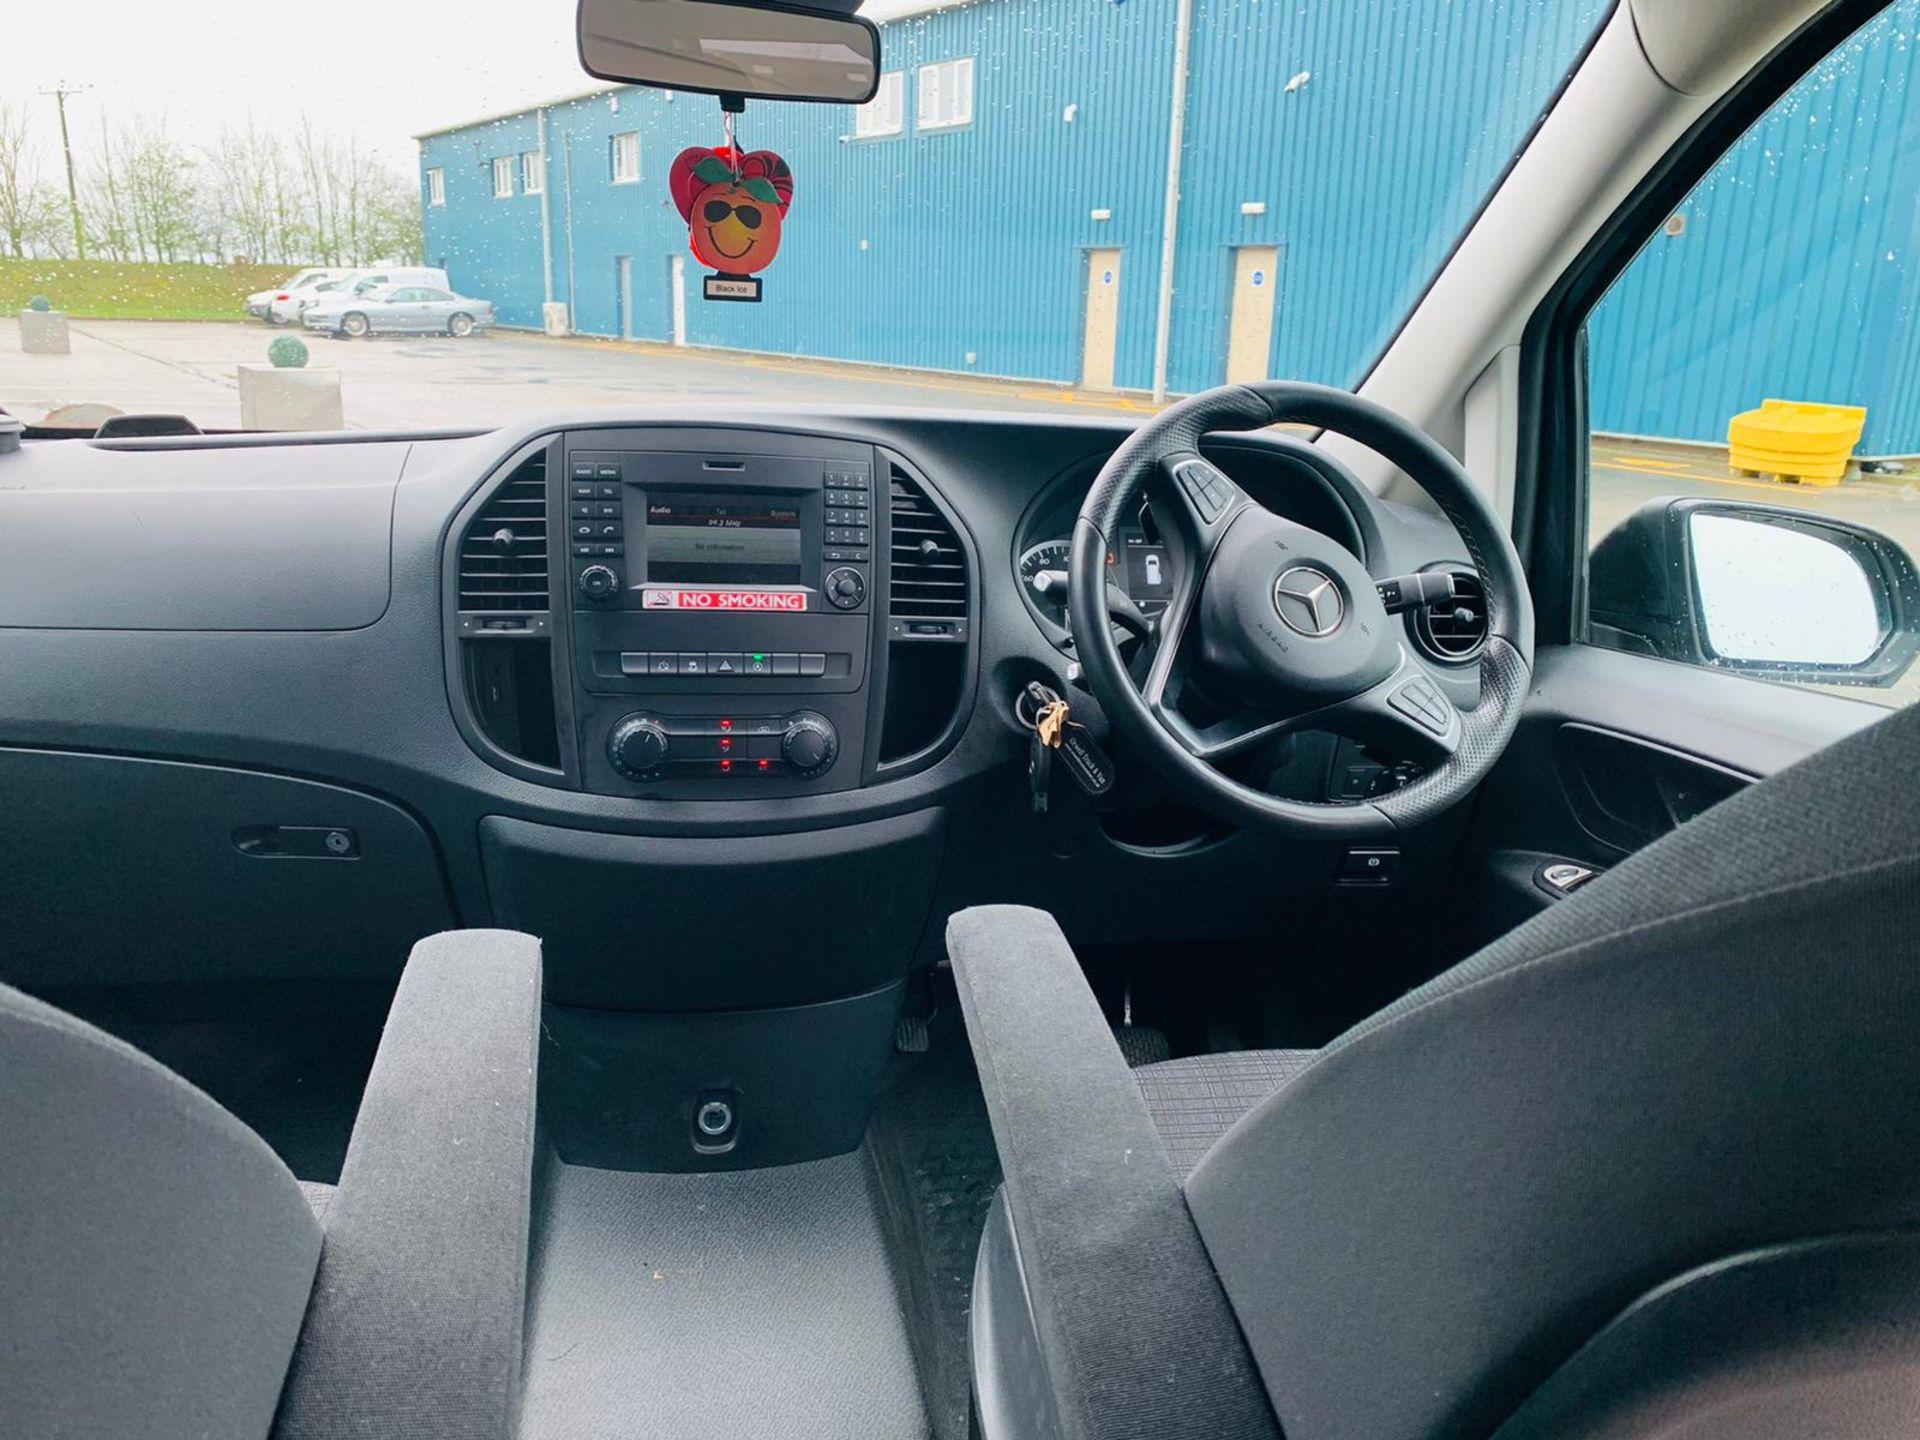 Mercedes Vito 114 Bluetec Dualiner/Crew Van - Auto - Air Con - 2018 18 Reg - 1 Owner From New - Image 17 of 25